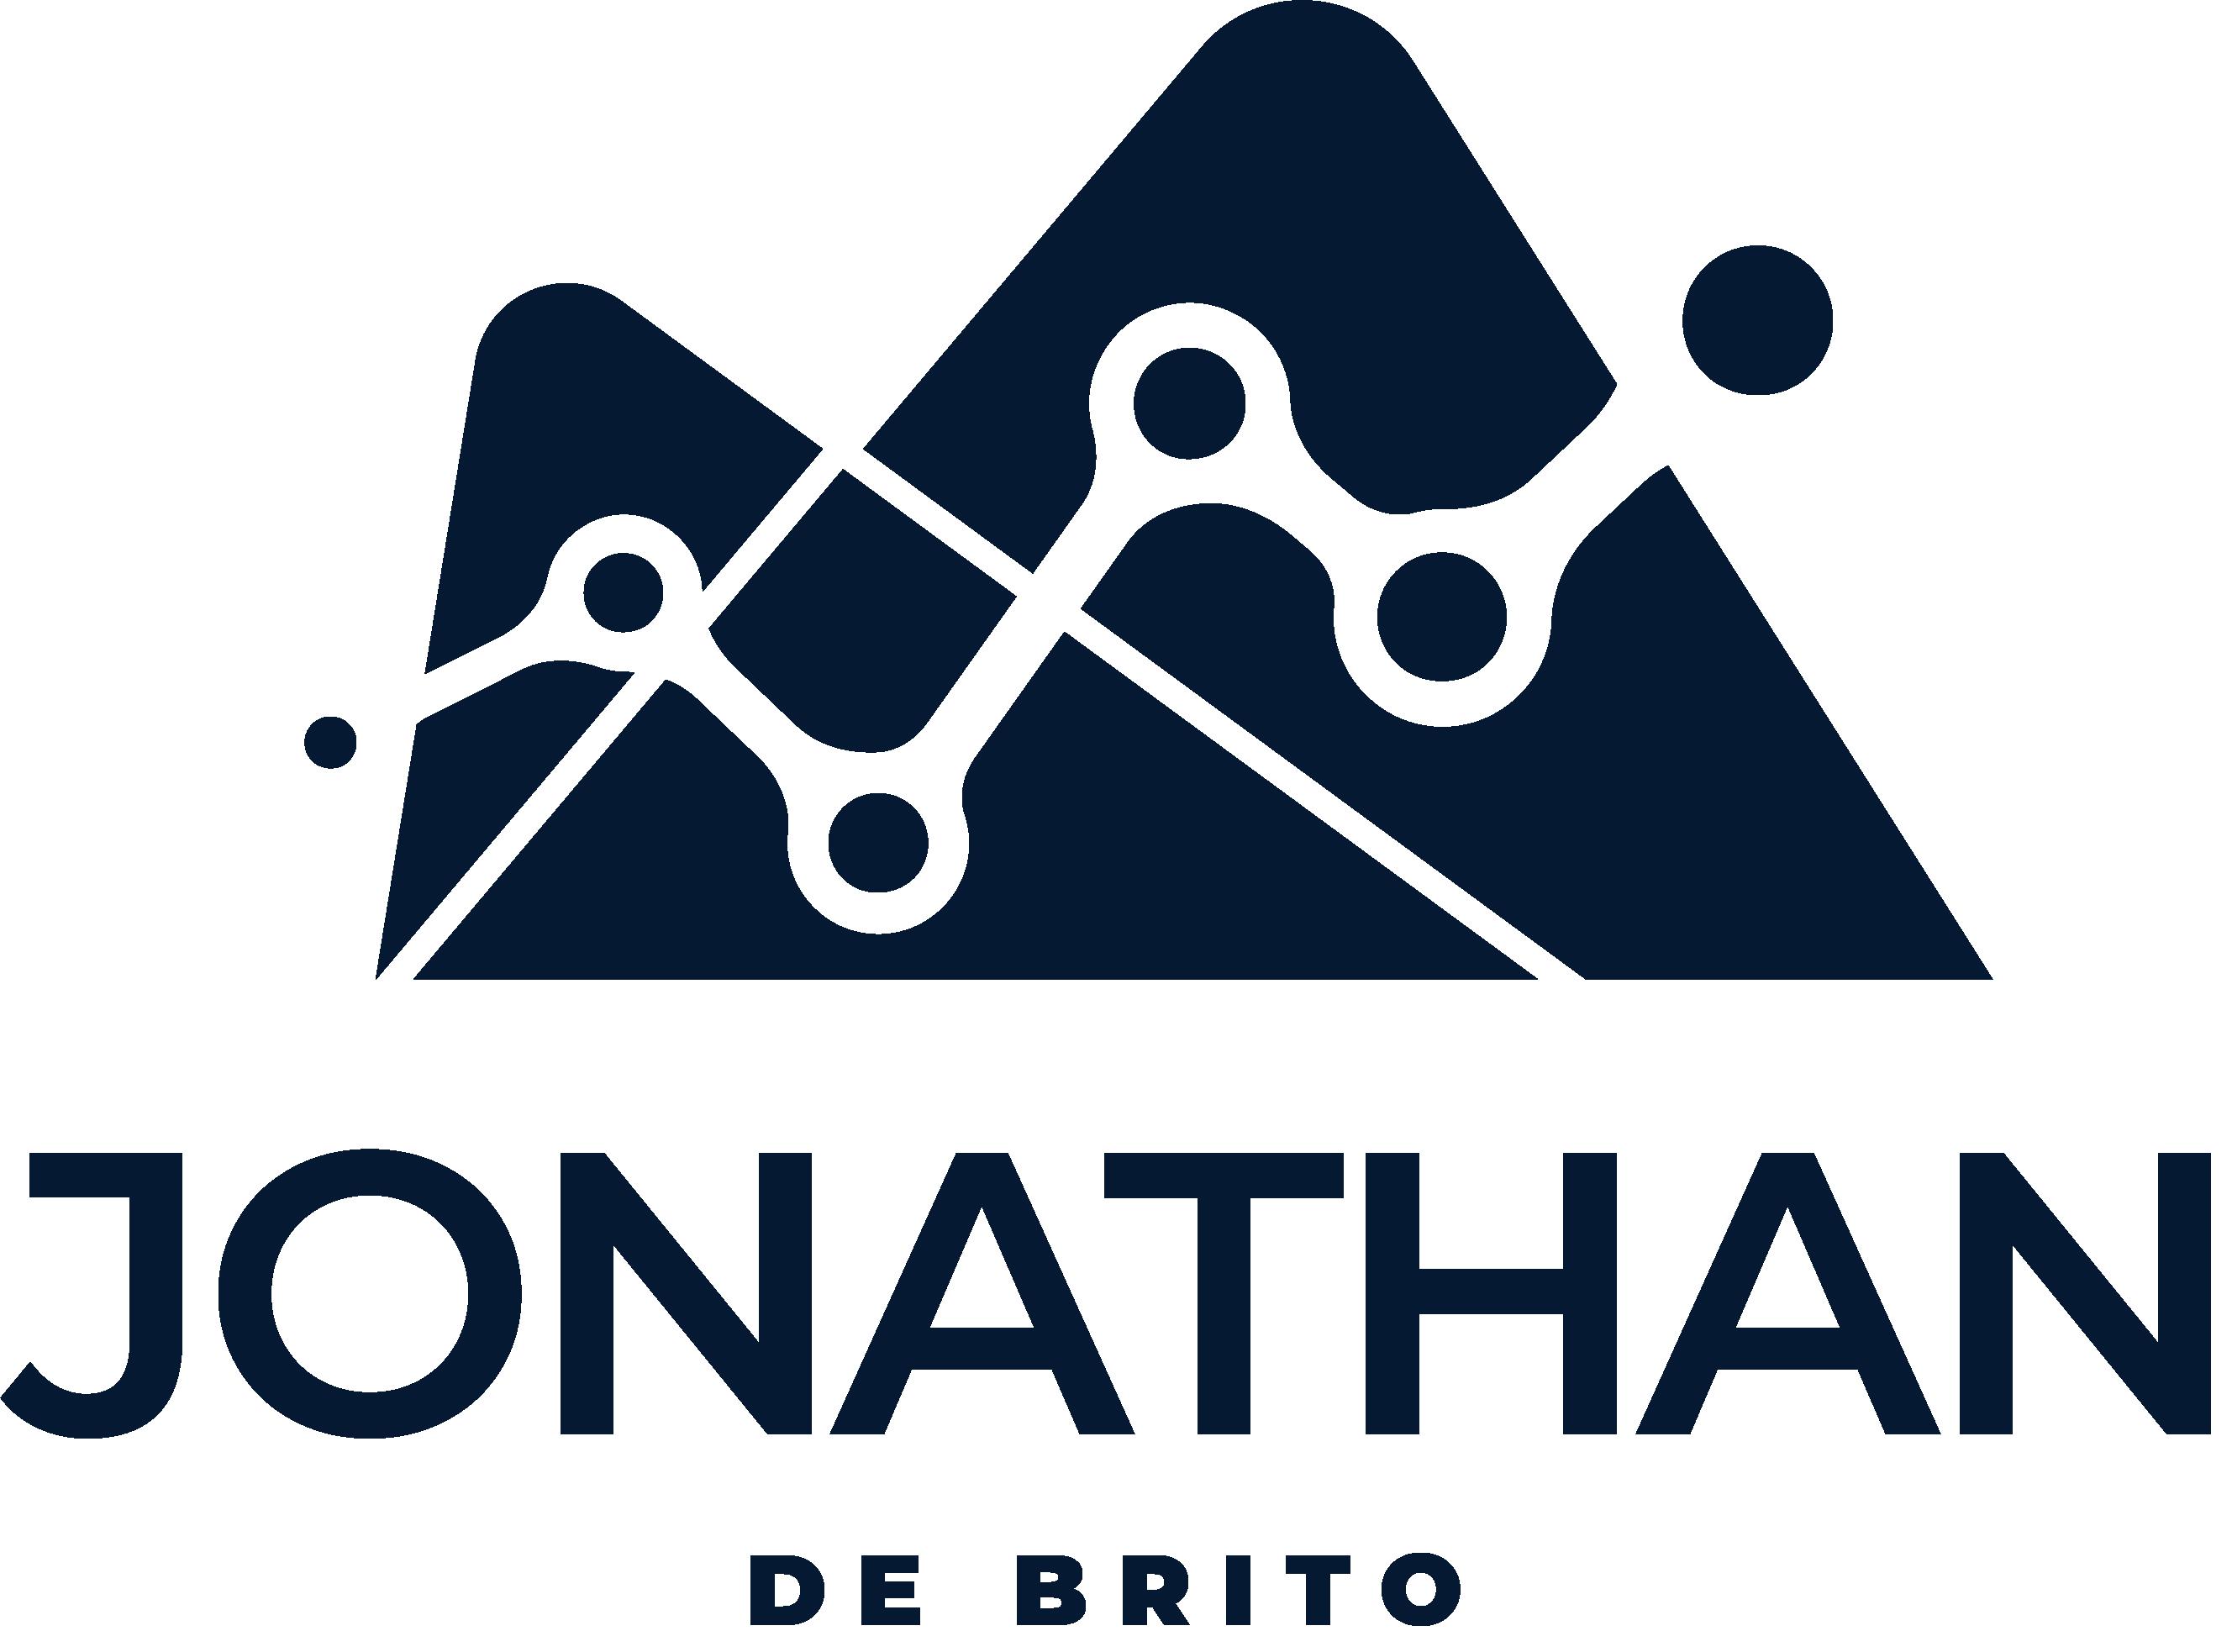 Jonathan de Brito